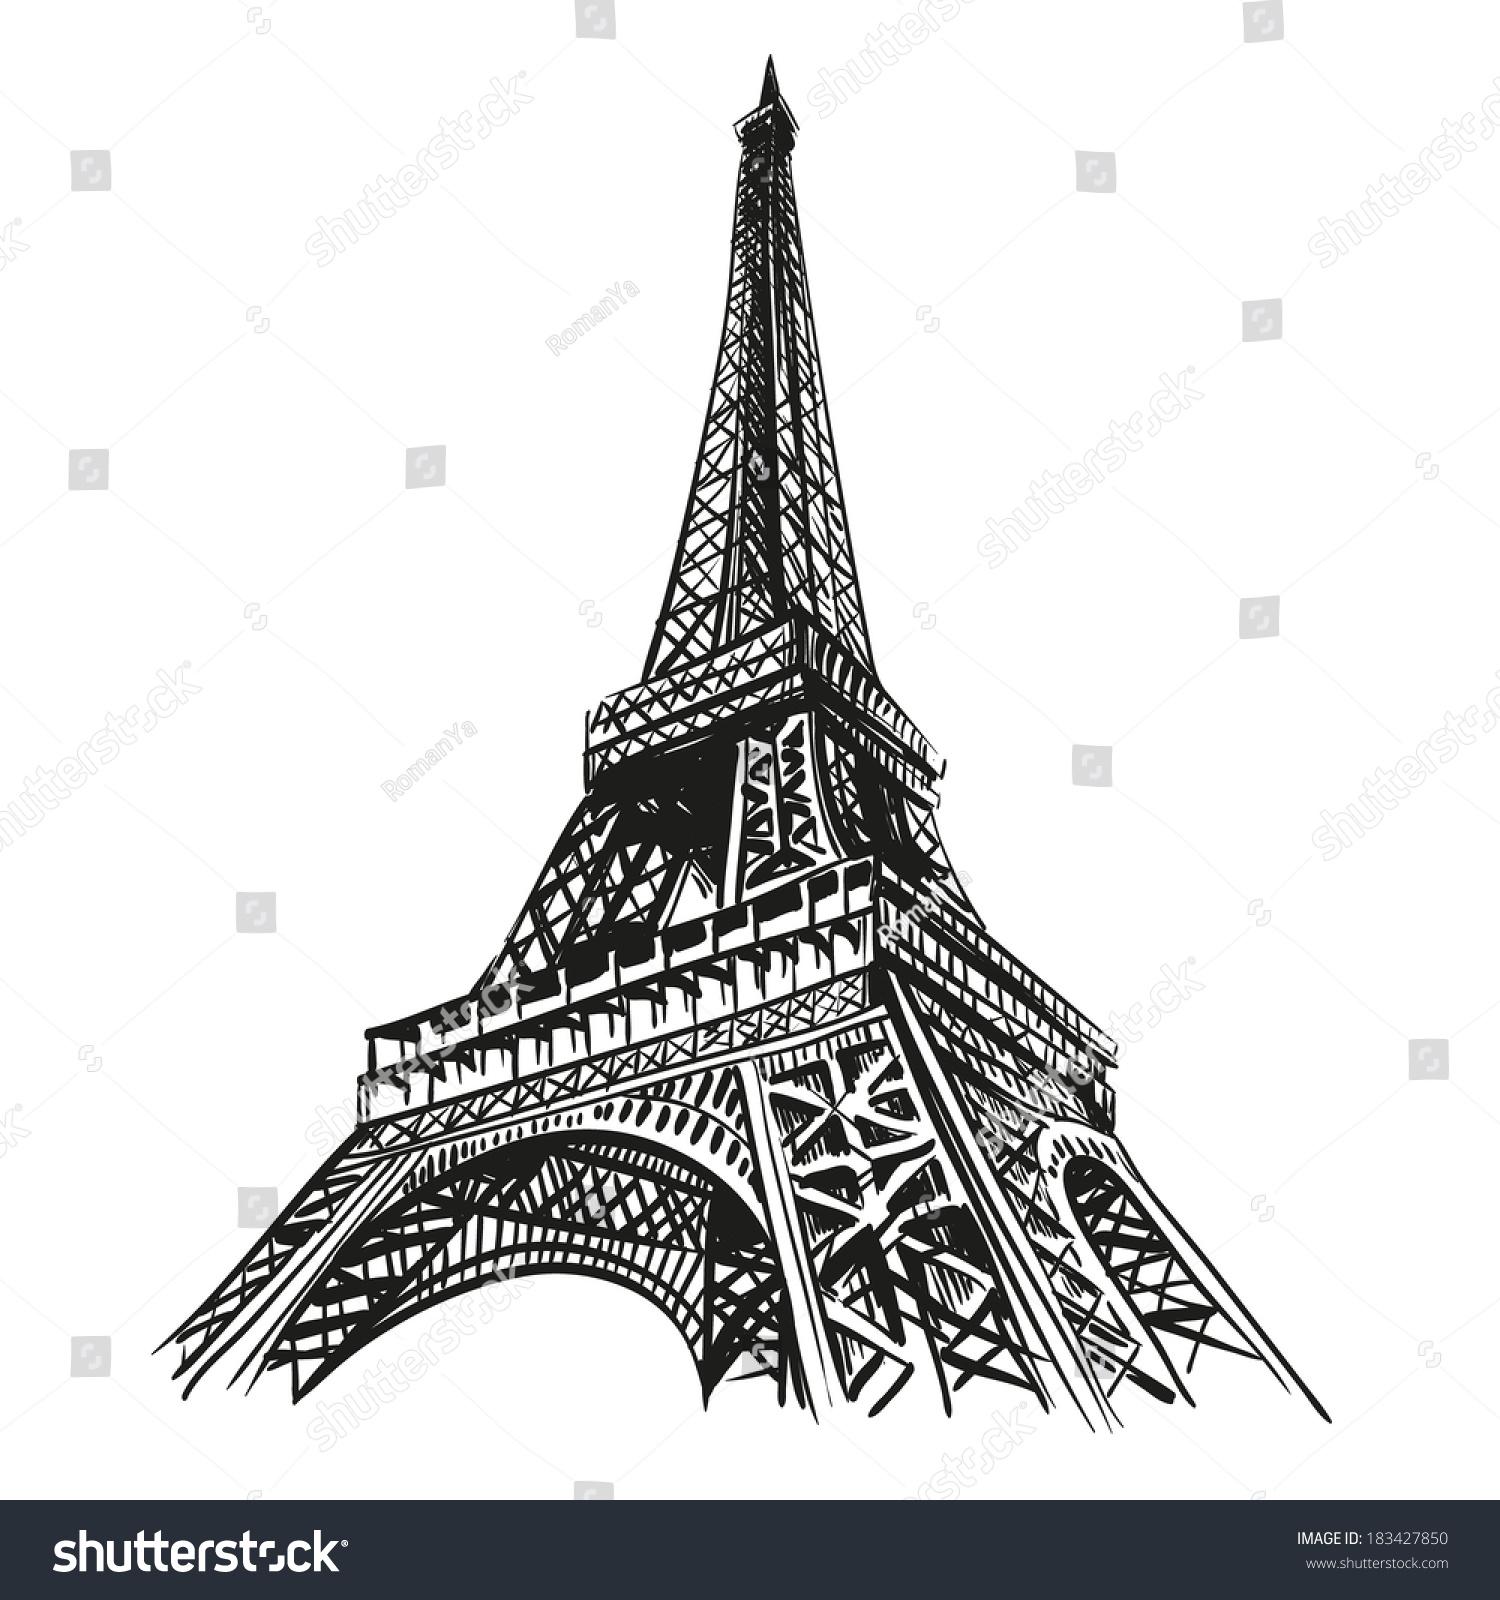 Paris Illustration: Hand Drawn Eiffel Tower Paris Vector Stock Vector